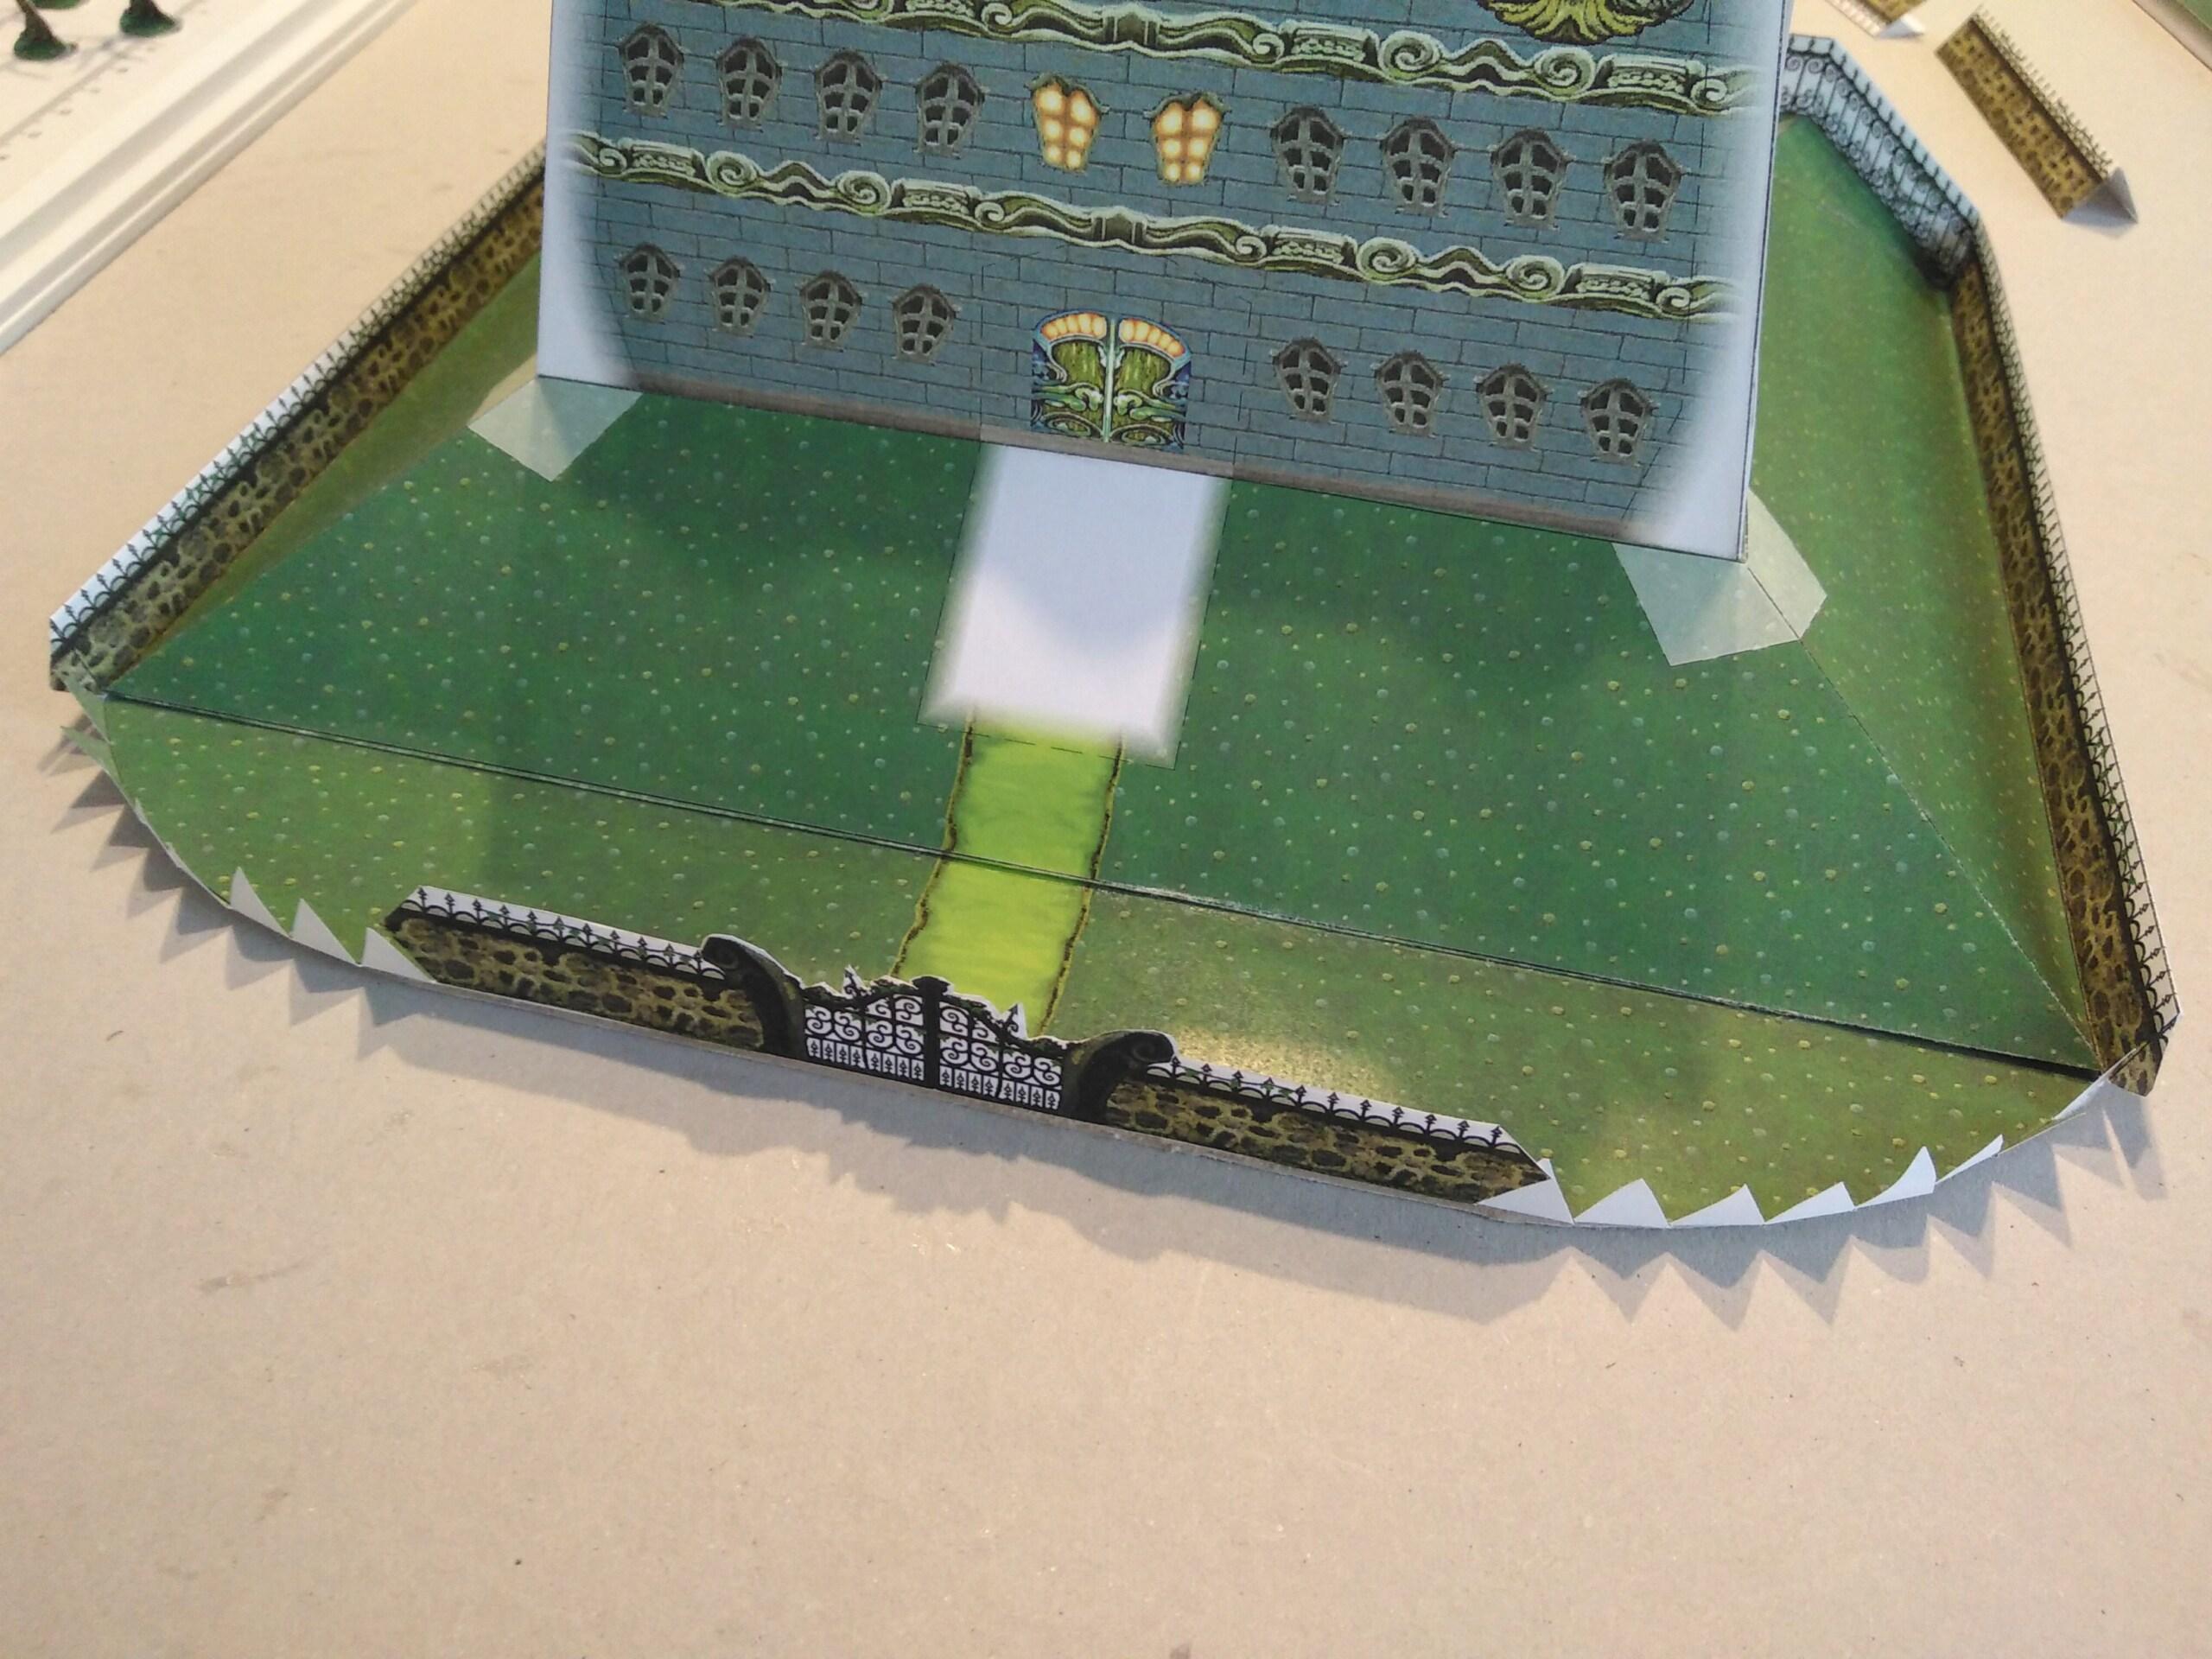 Luigi's Mansion - Die Gruselvilla aus dem Gamecube-Klassiker Img_2024